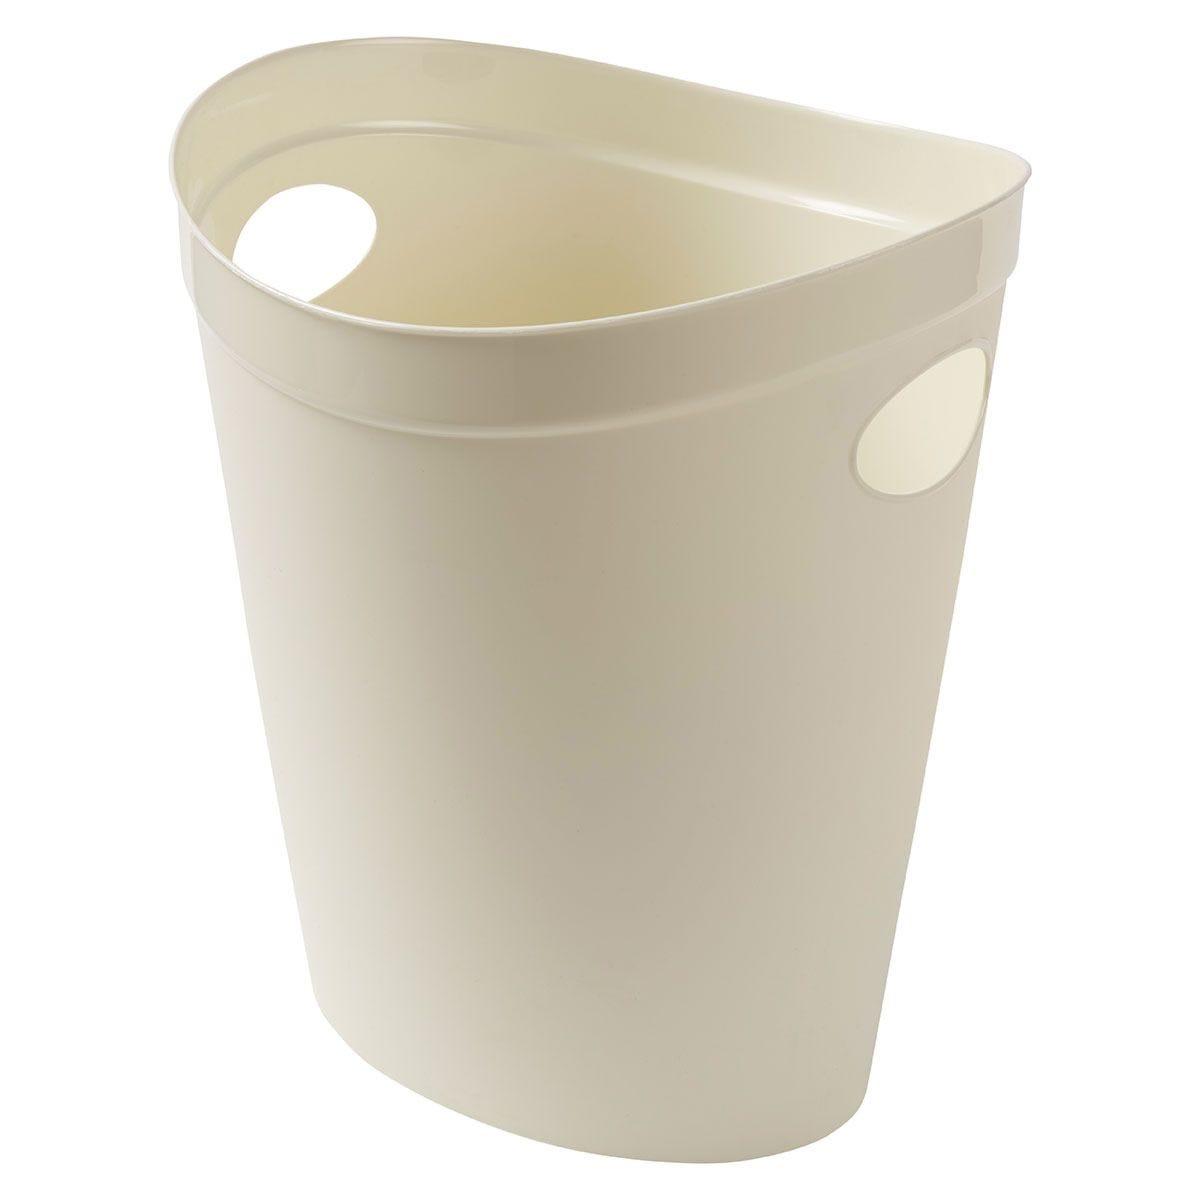 Addis Waste Paper Bin - Cream